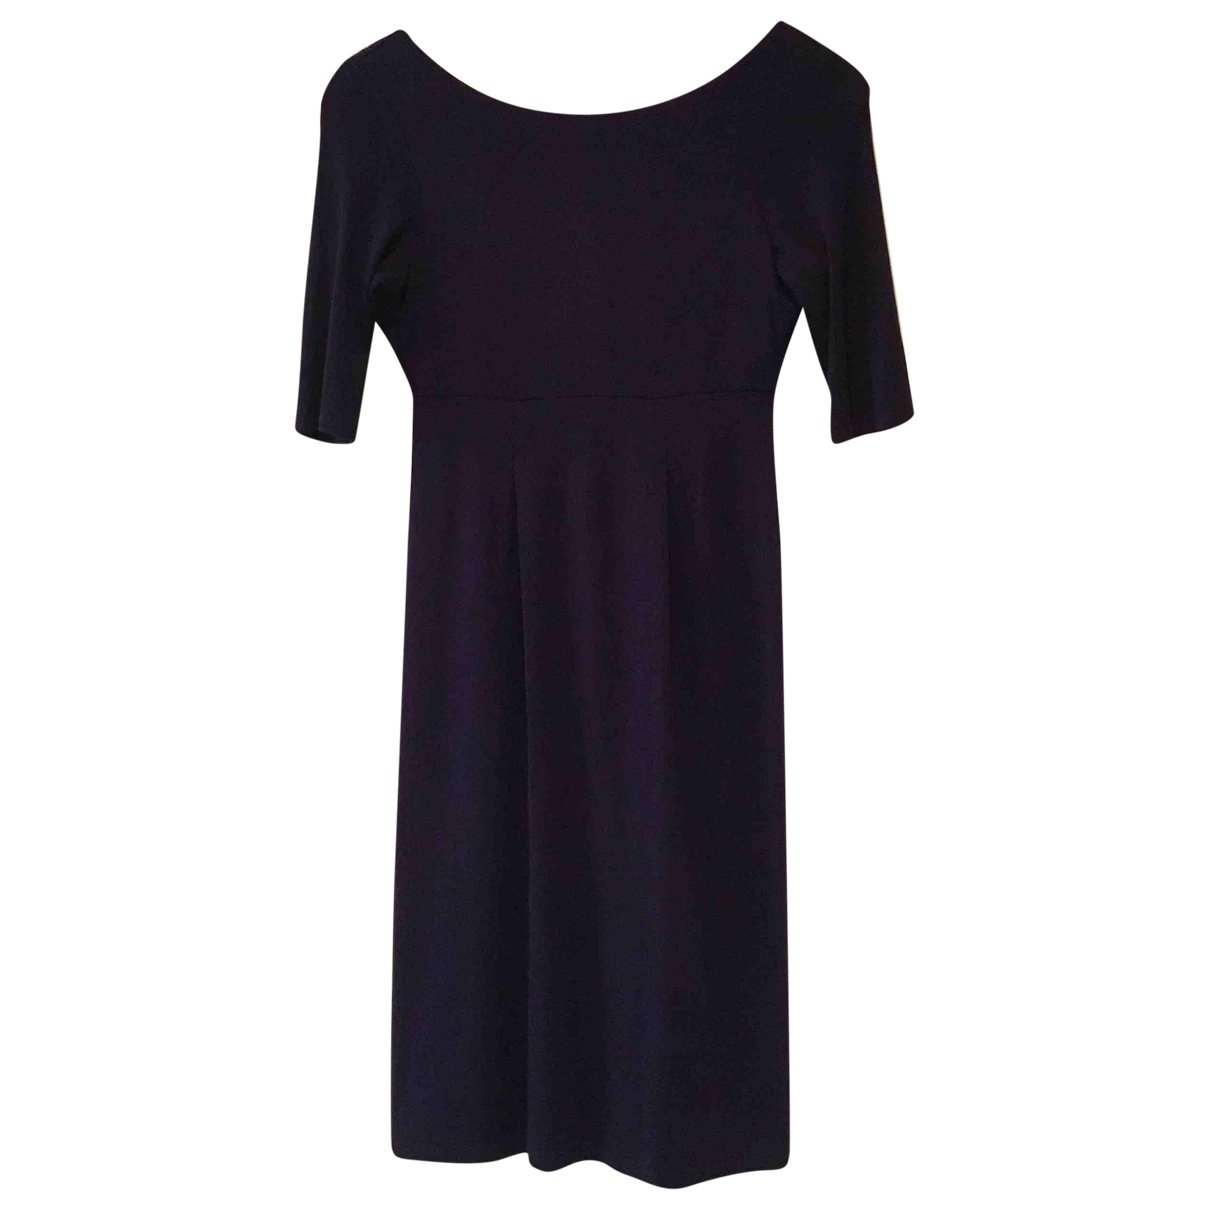 Lk Bennett \N Kleid in  Lila Baumwolle - Elasthan